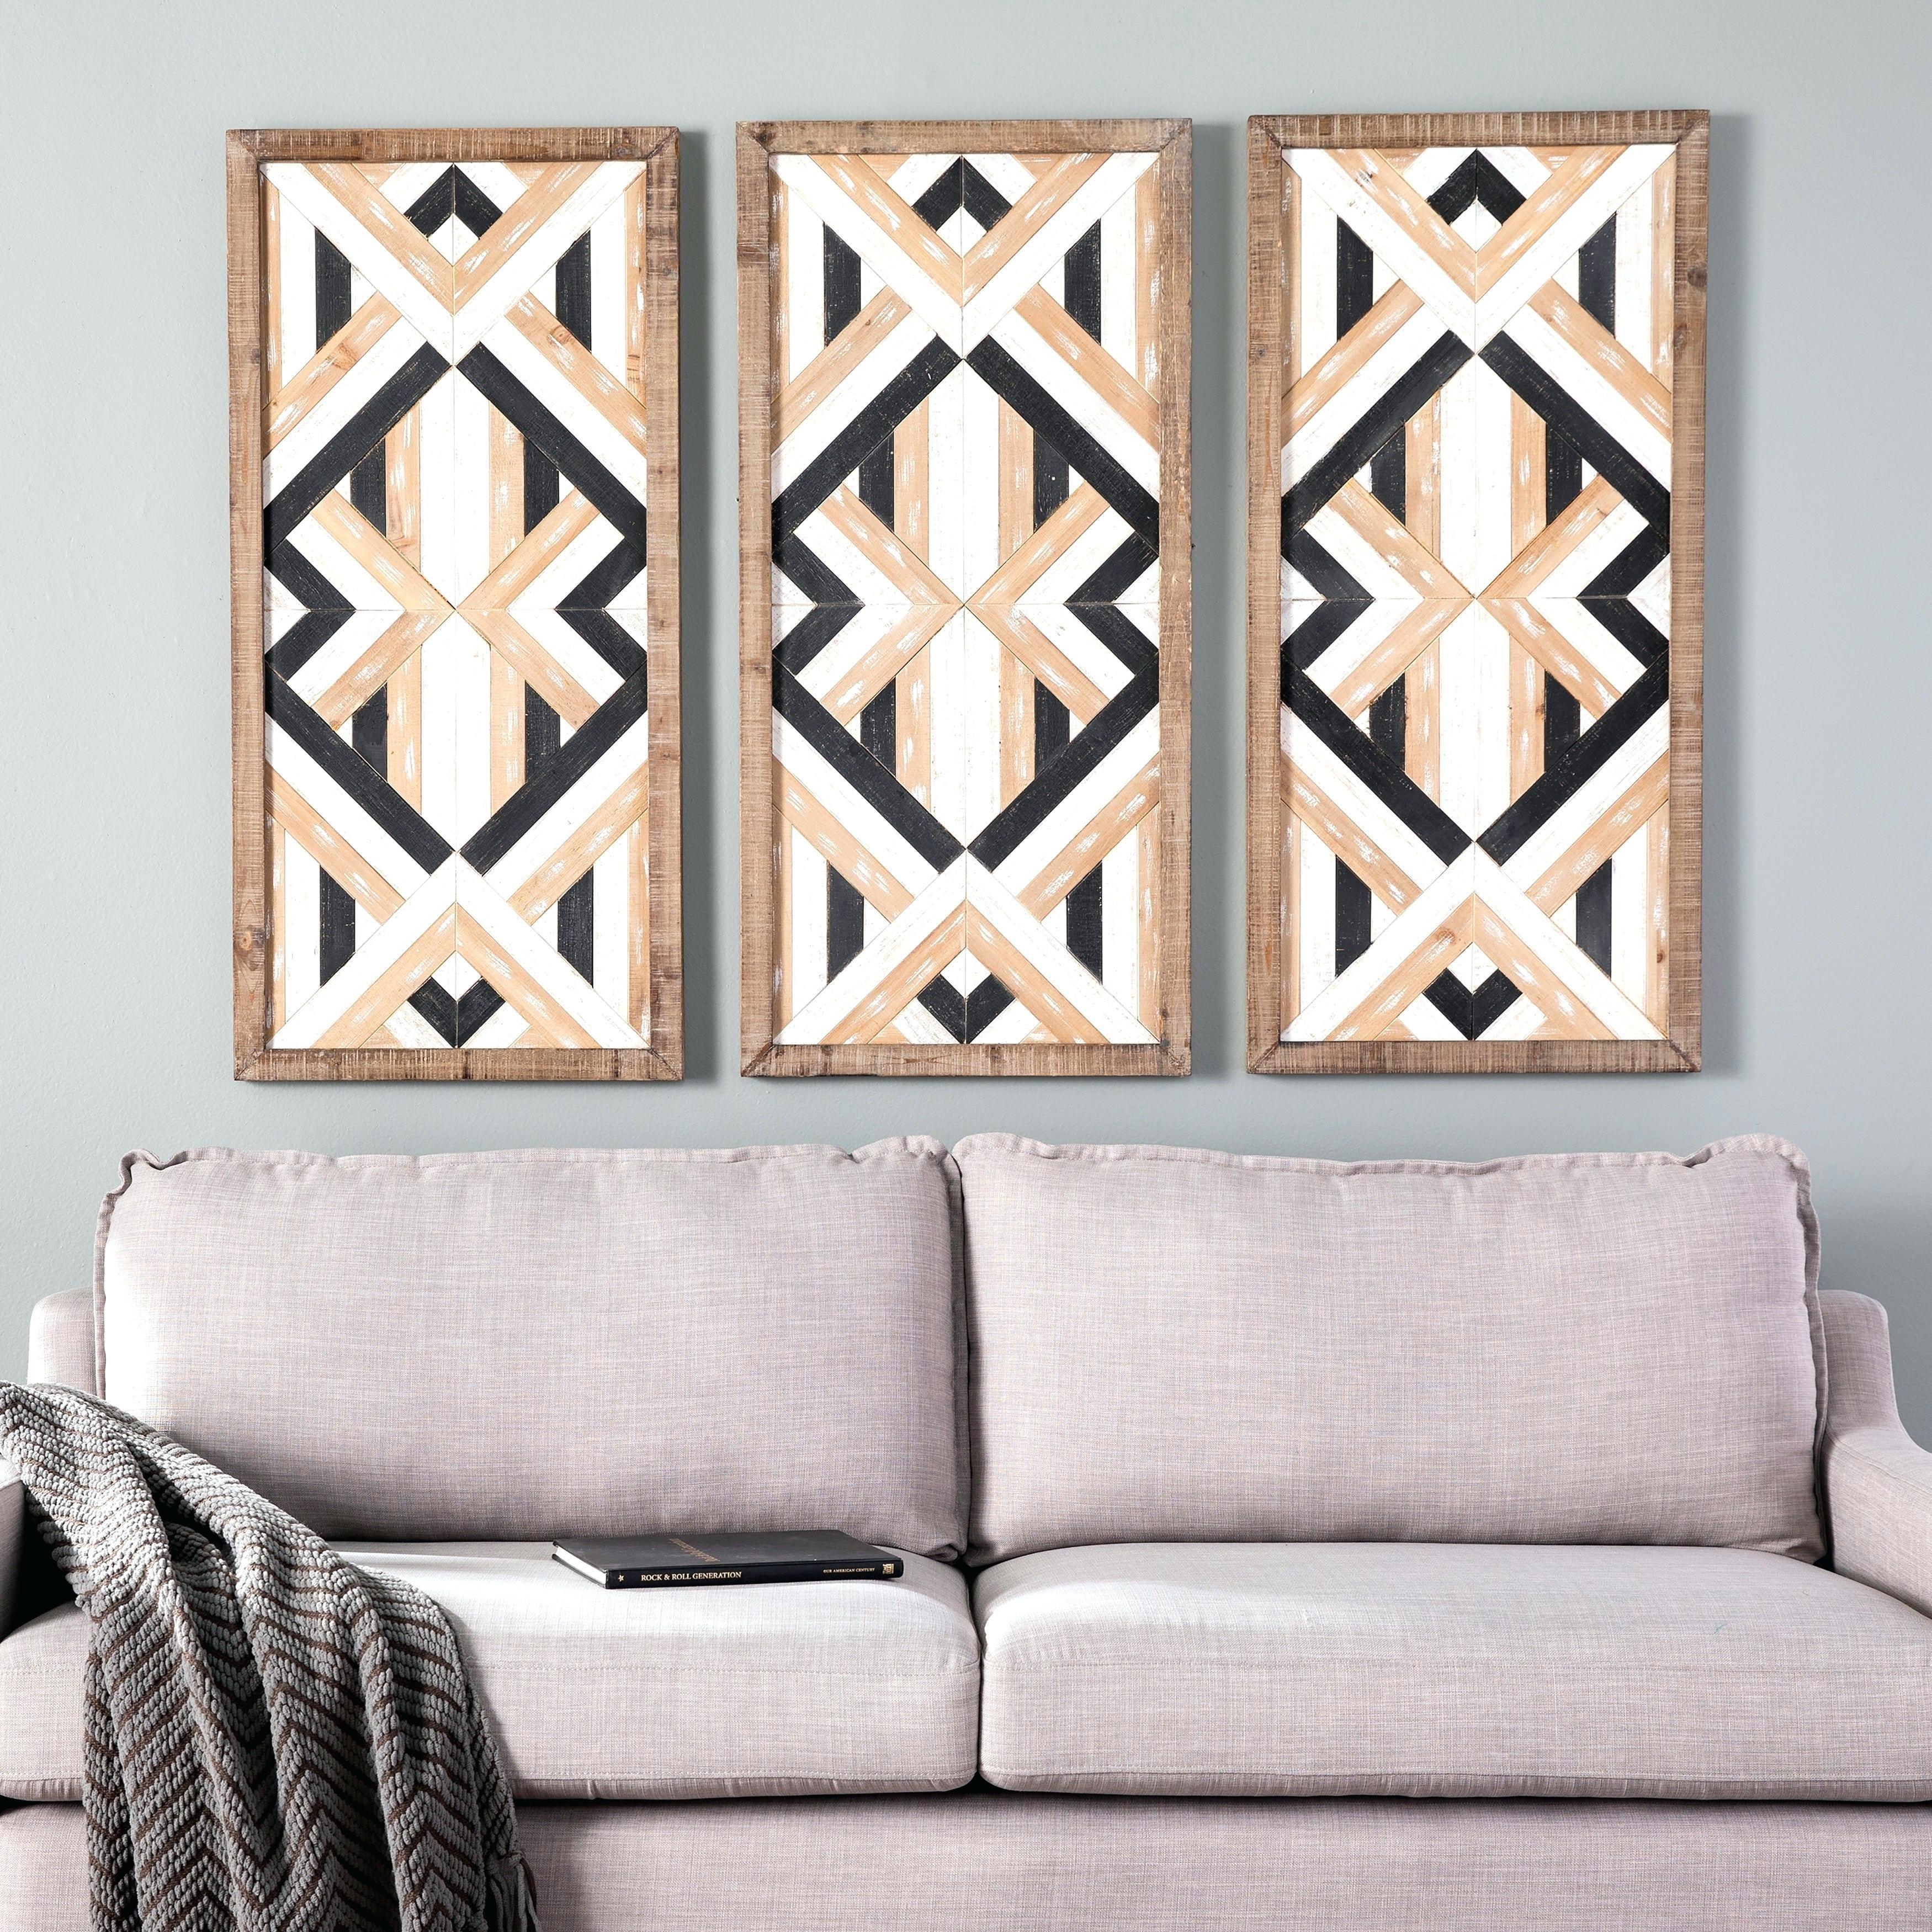 Decorative Wall Pictures – Onthehorizon.co Regarding Bem Decorative Wall Mirrors (Photo 29 of 30)